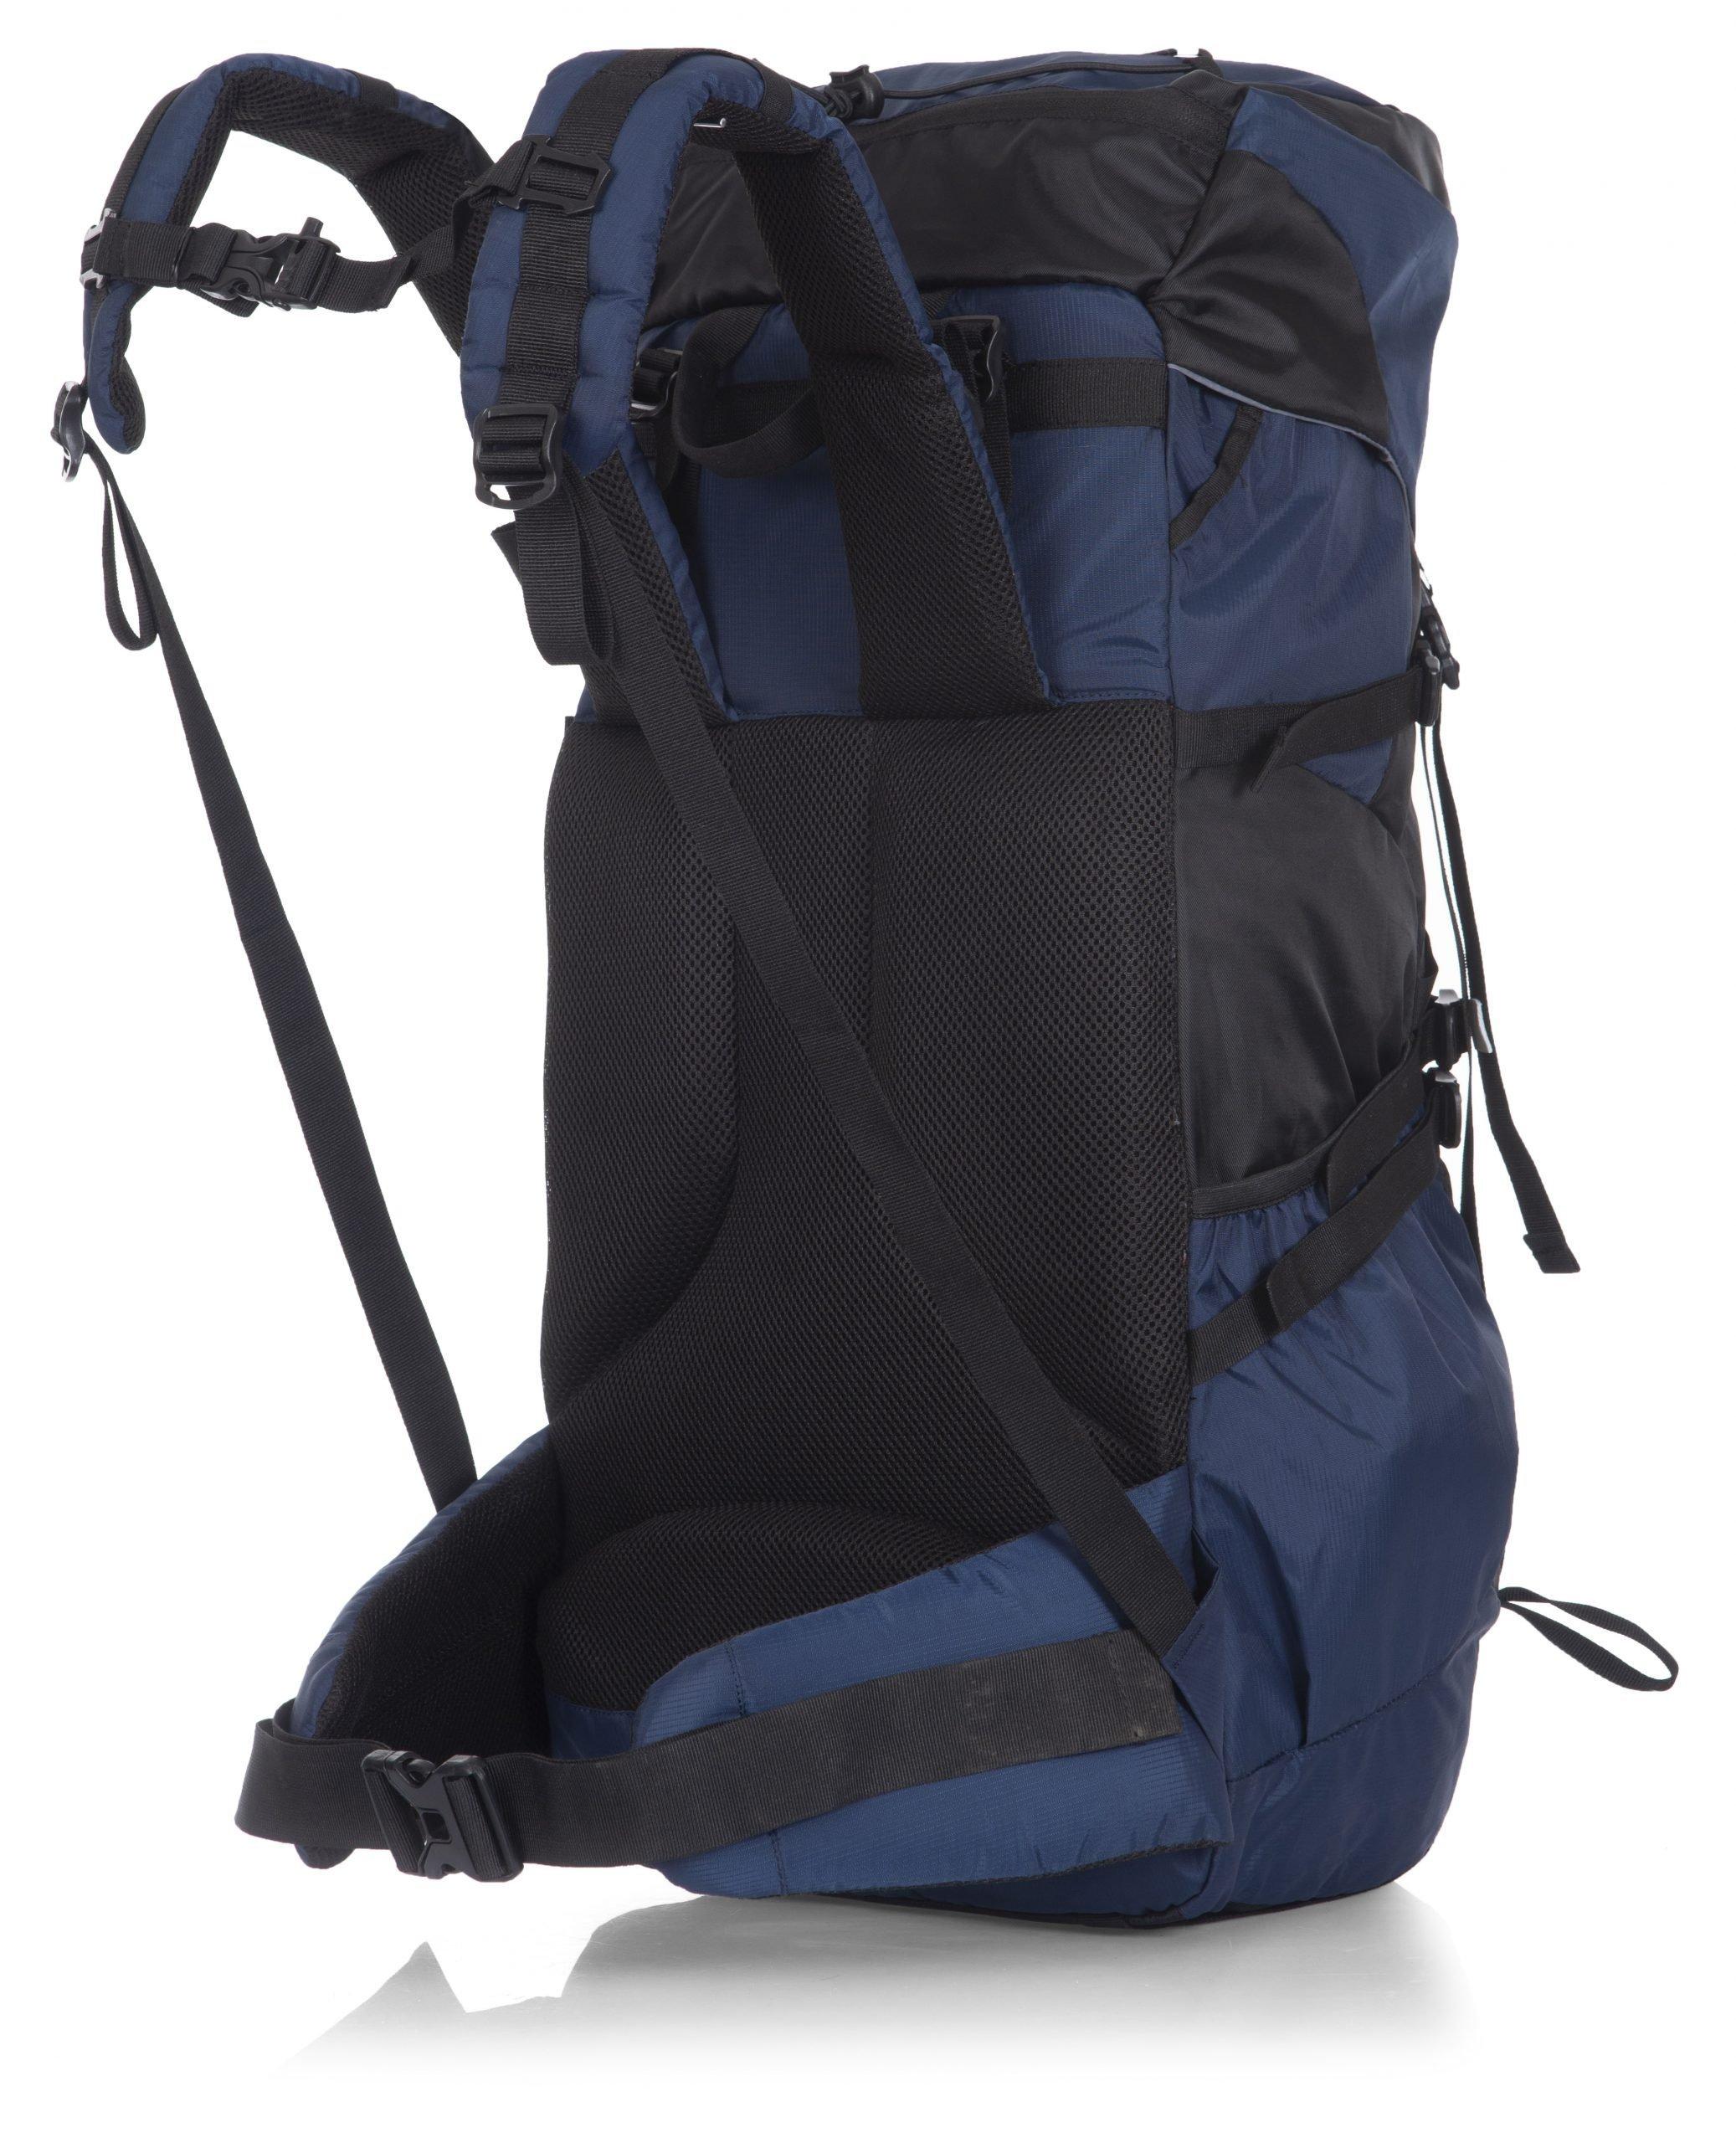 Globo 45 bag